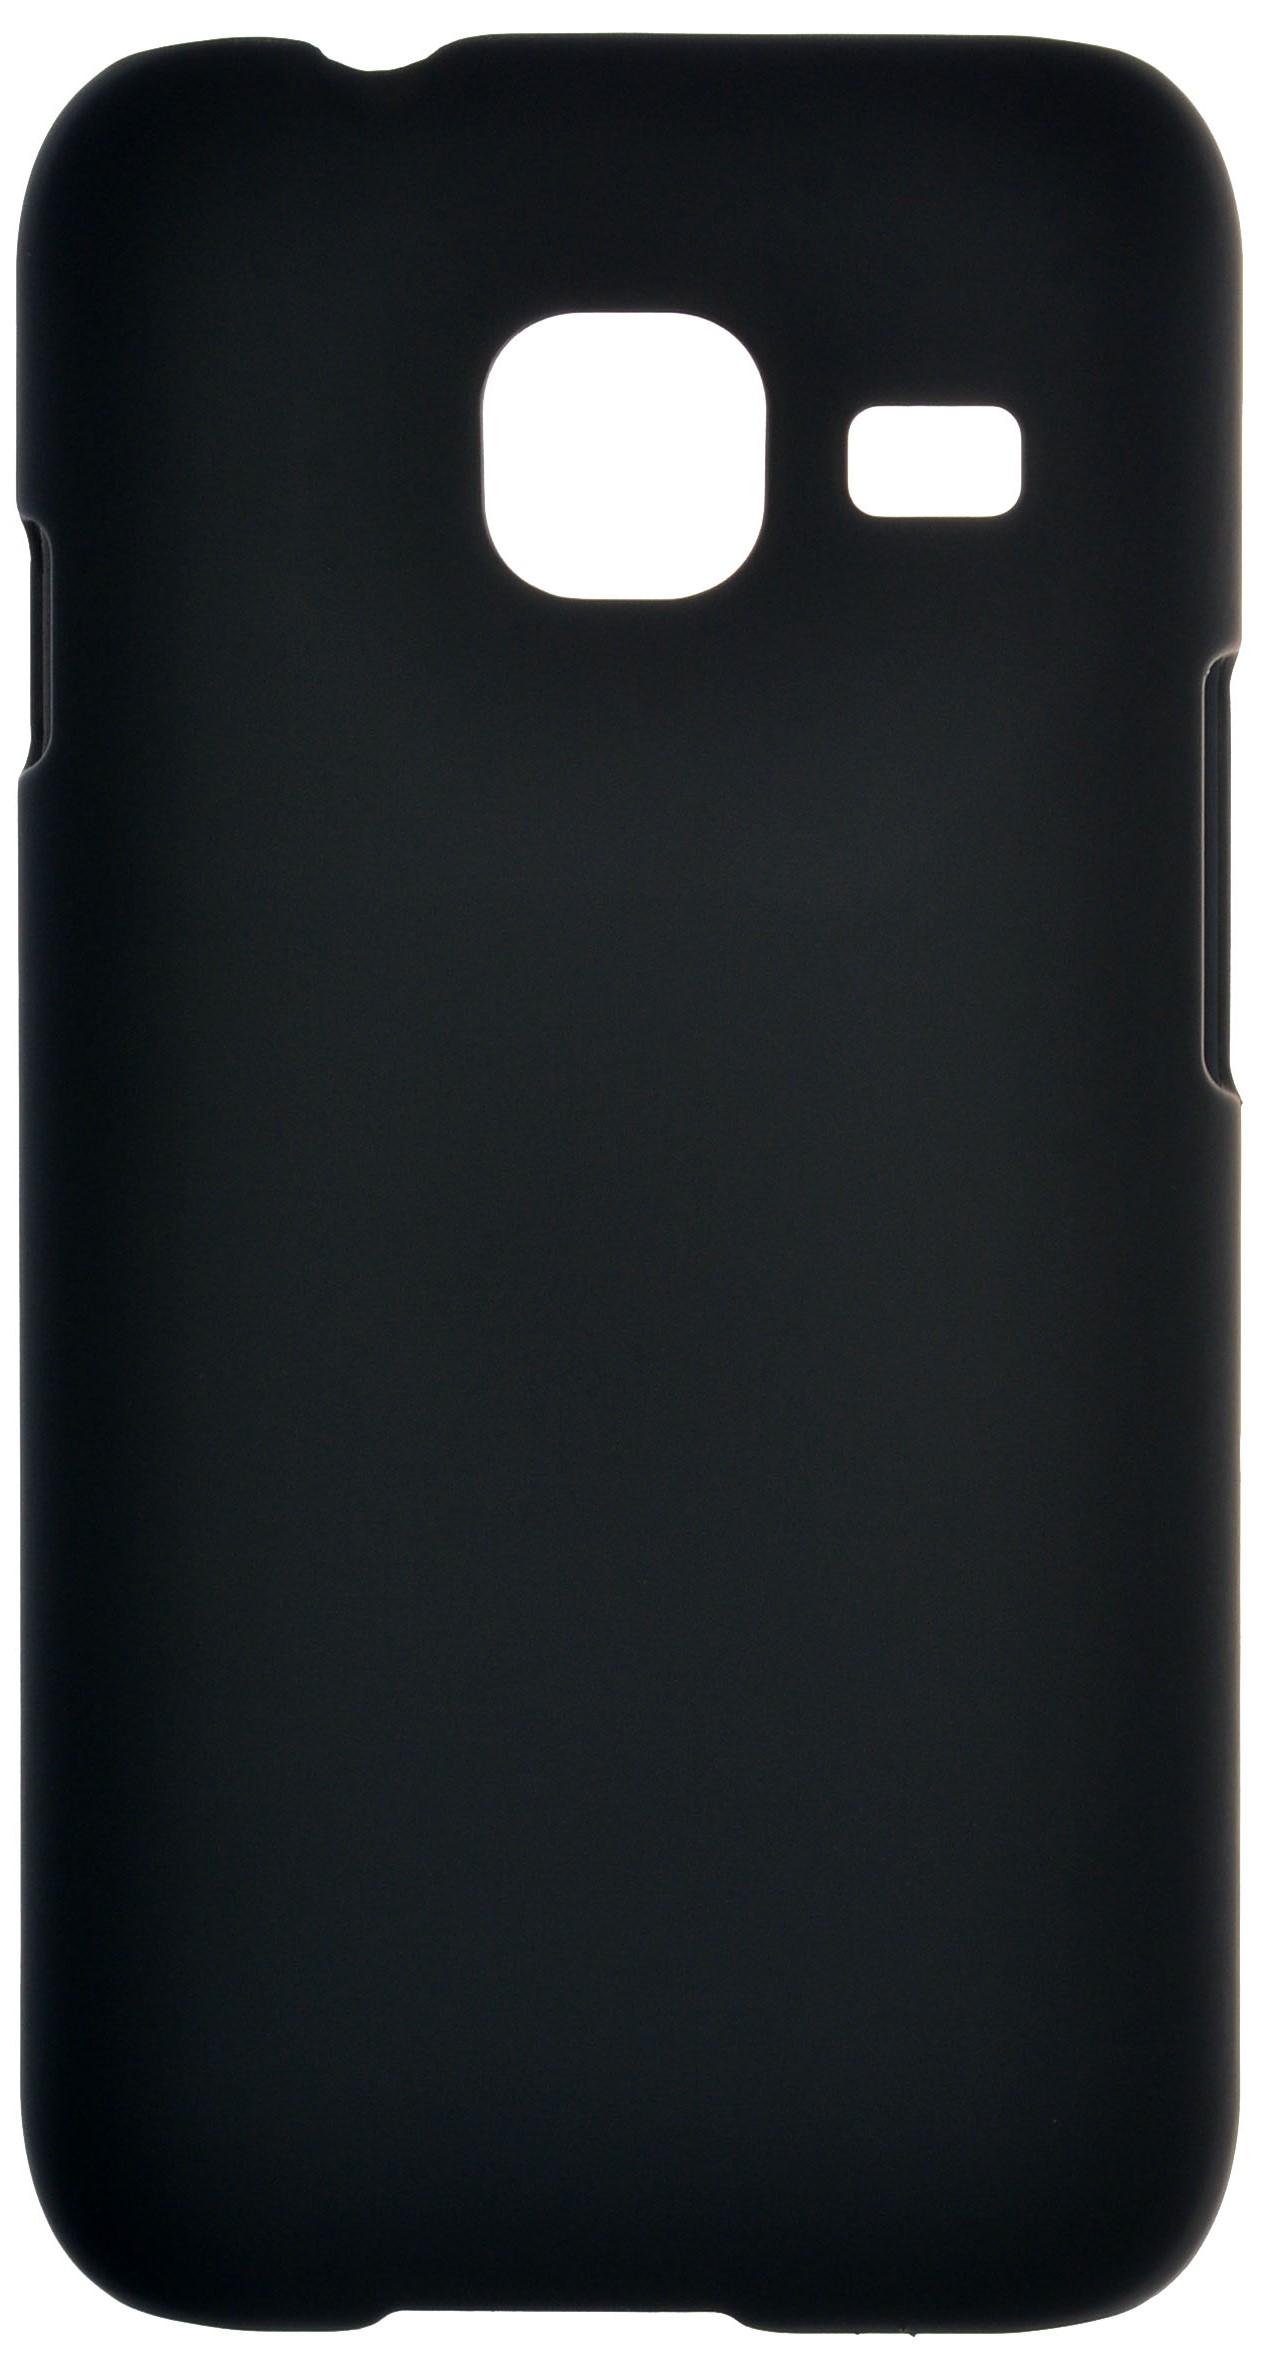 Чехол skinBOX 4People case для Samsung Galaxy J1 mini (2016) SM-J105H, черный